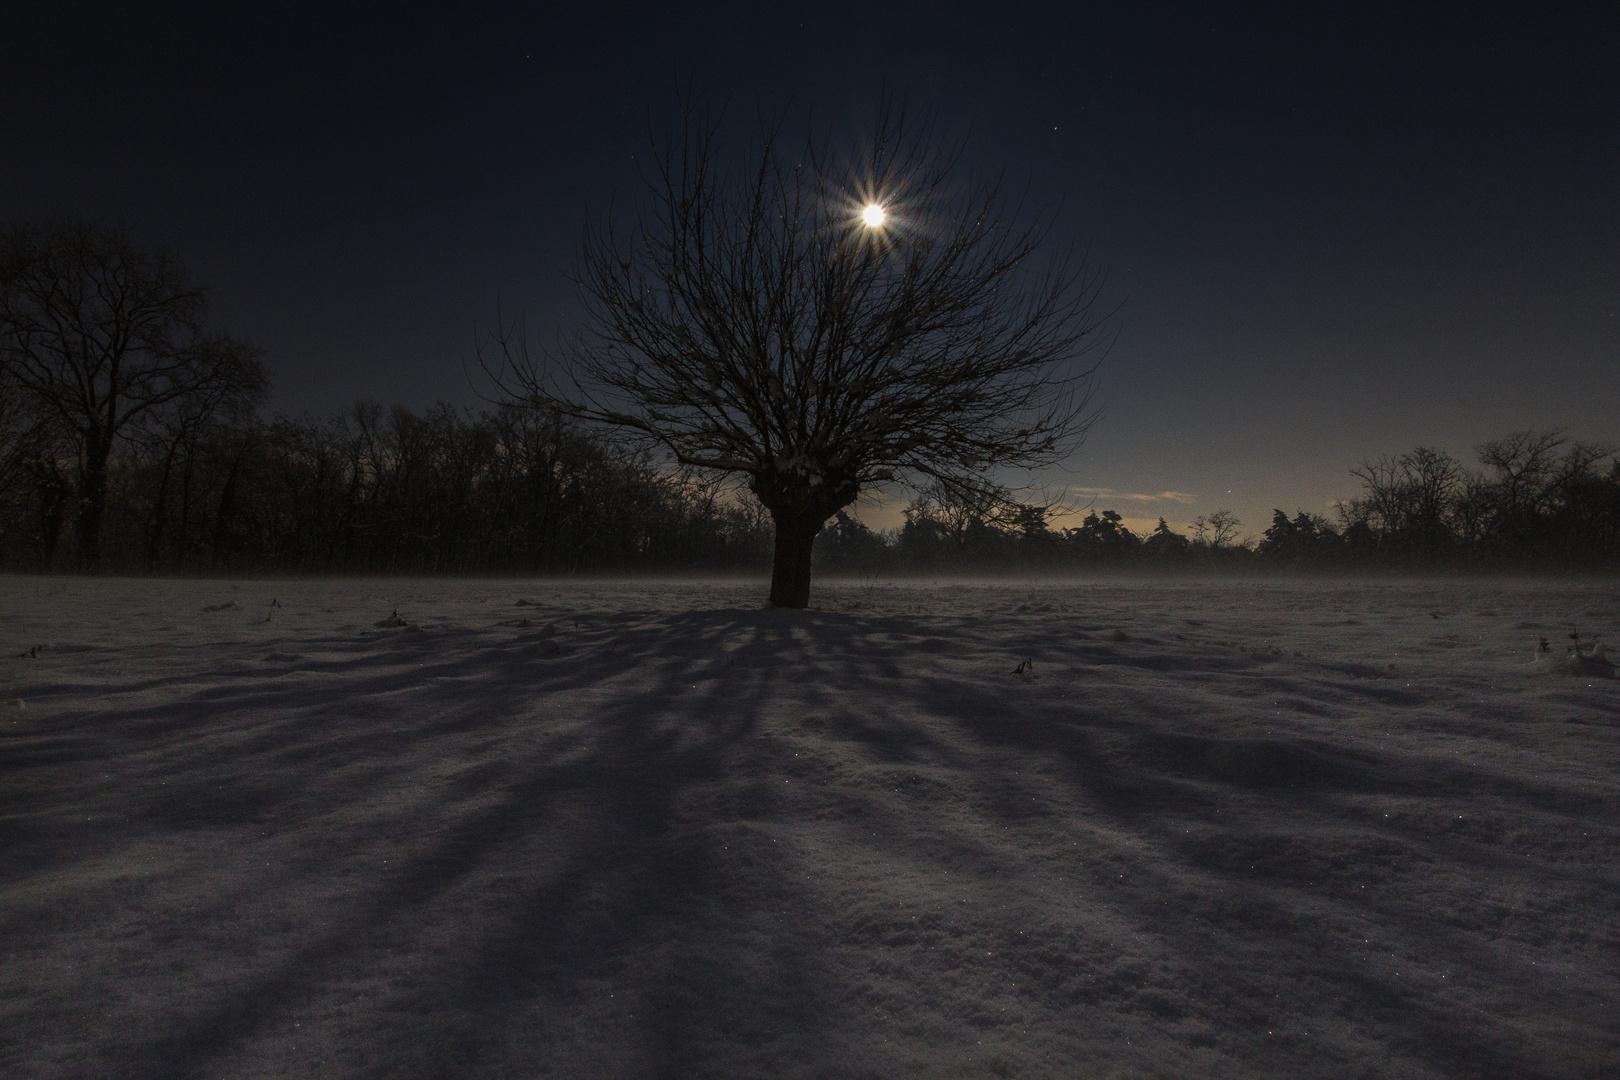 moon light shadows